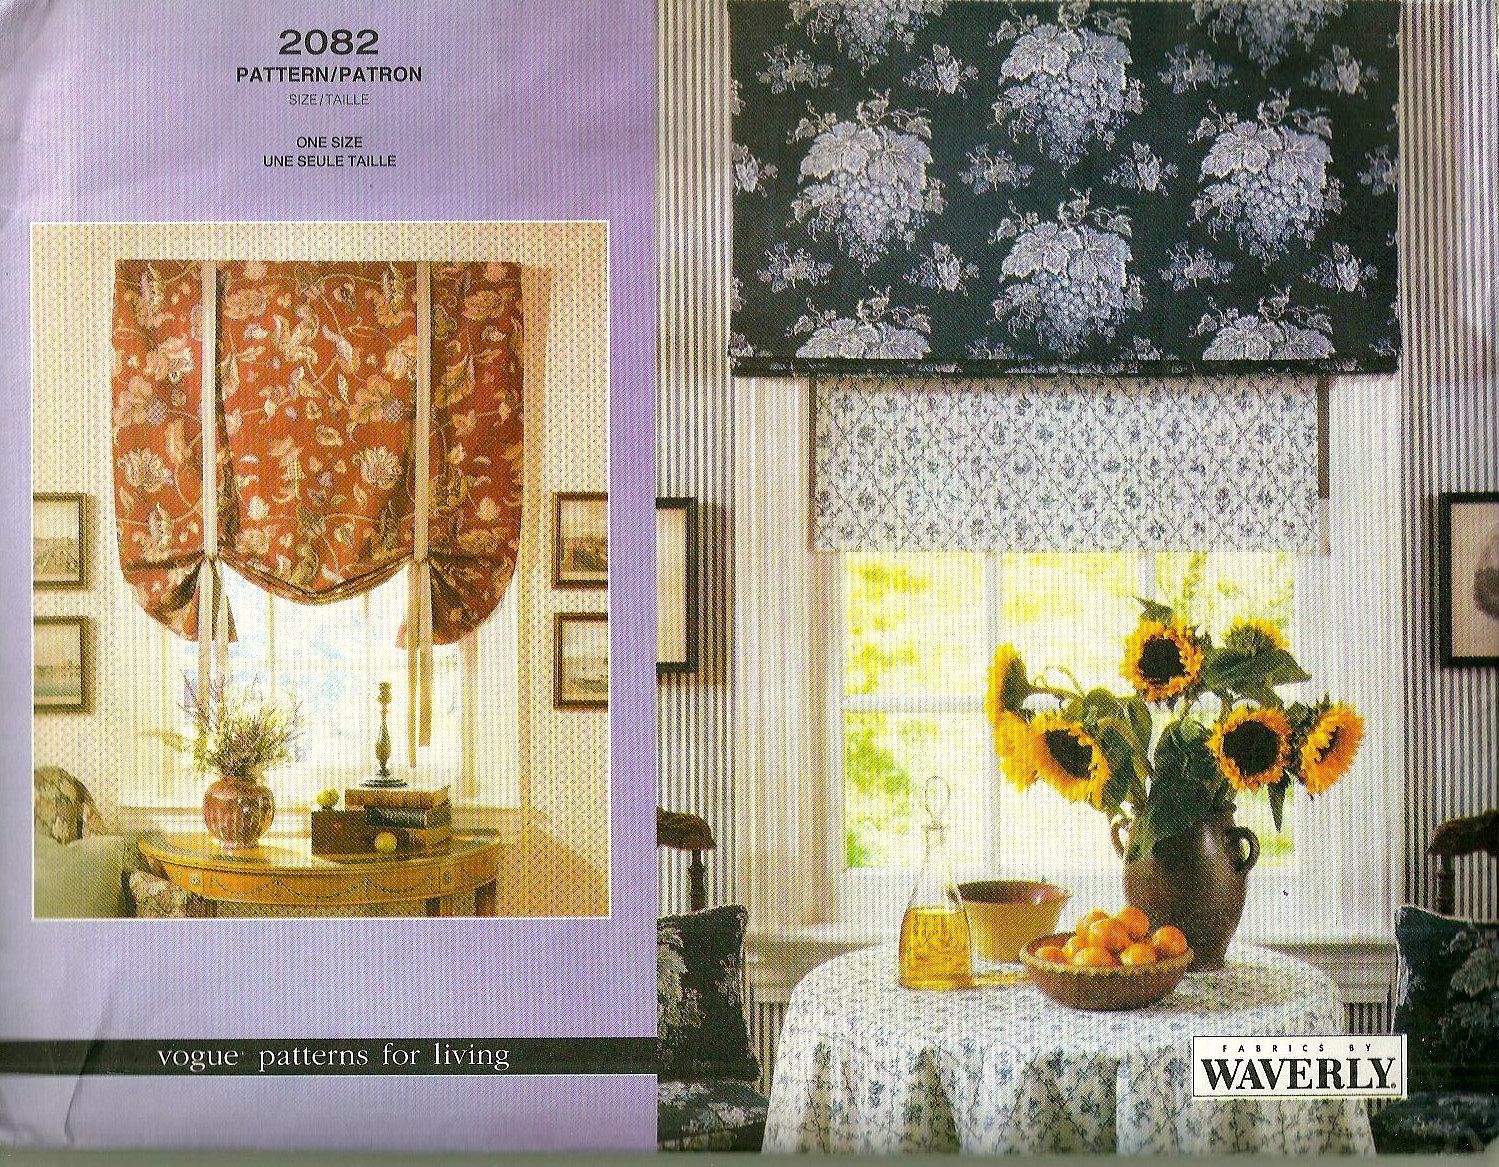 Vogue 2082 roman shades pattern home decor window treatment for Professional window treatment patterns